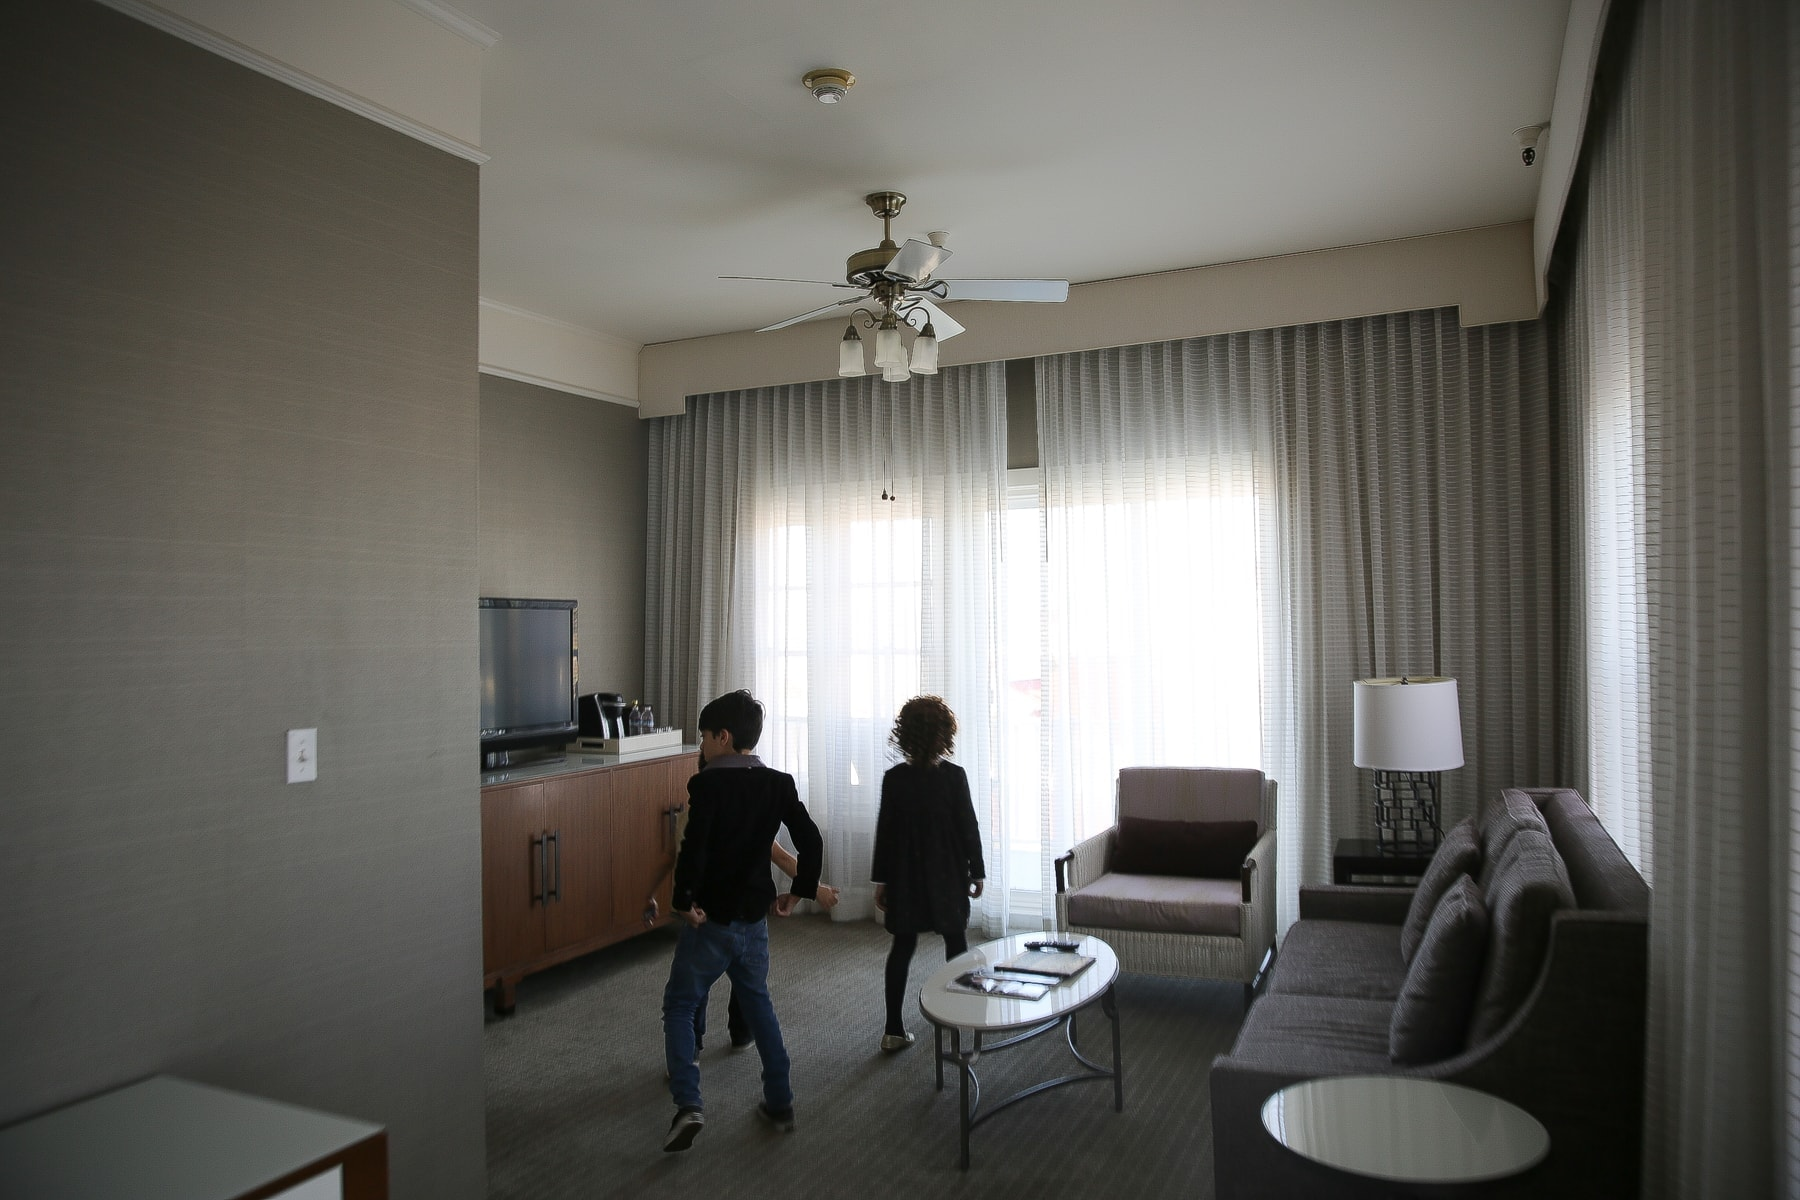 kids in haunted hotel room